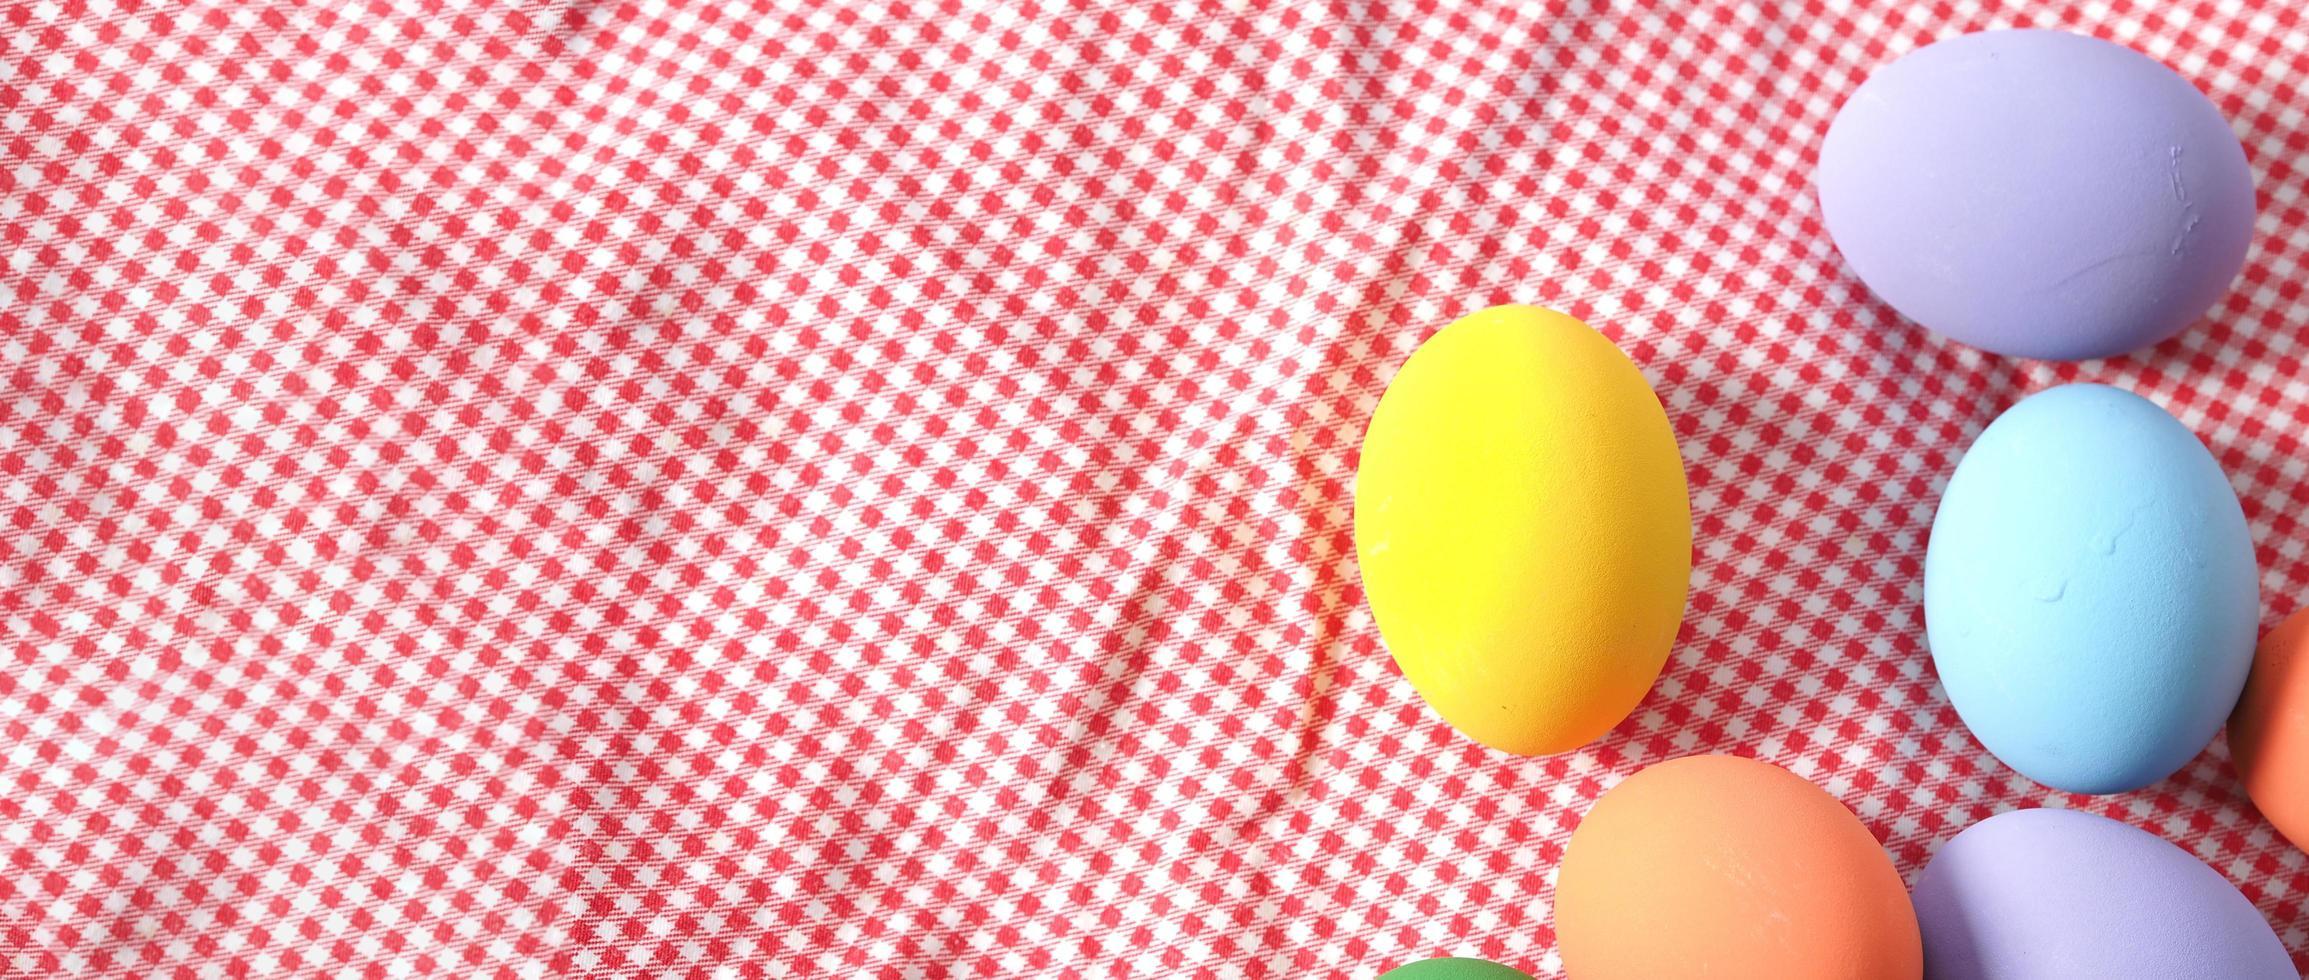 paaseieren of kleur ei. veelkleurig van paaseieren foto